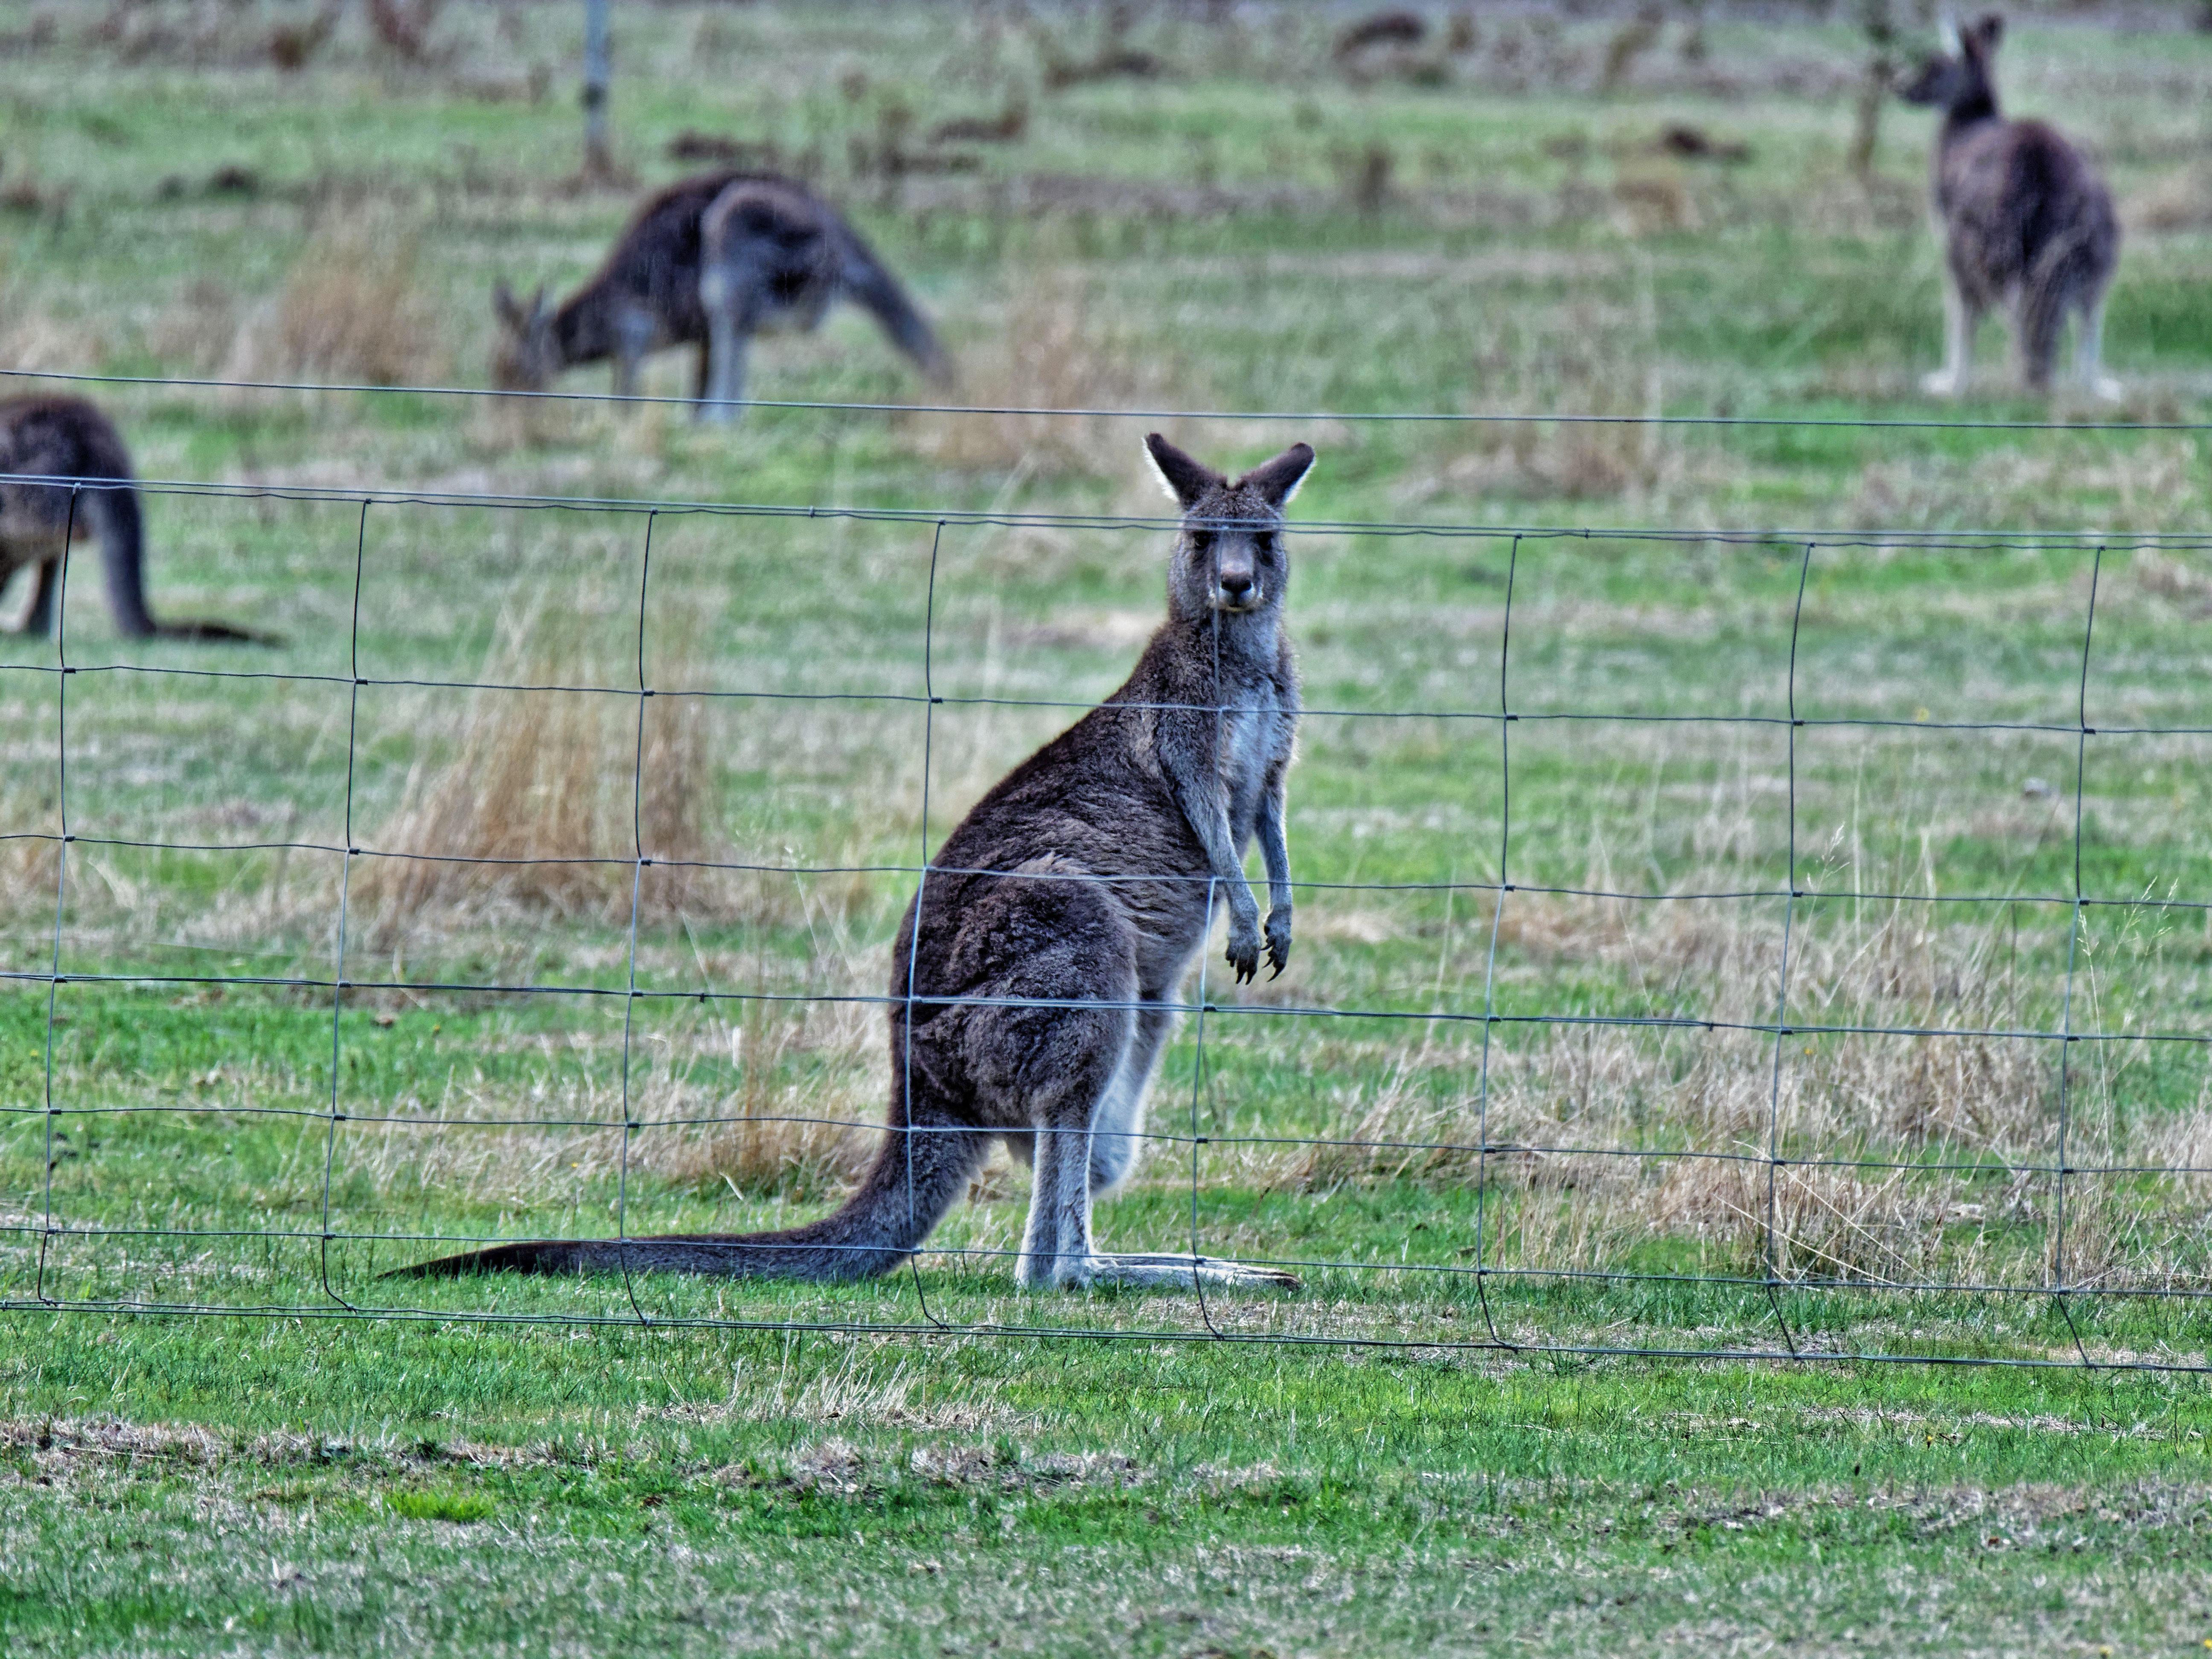 This should be Kangaroos-3.jpeg.  Is it missing?